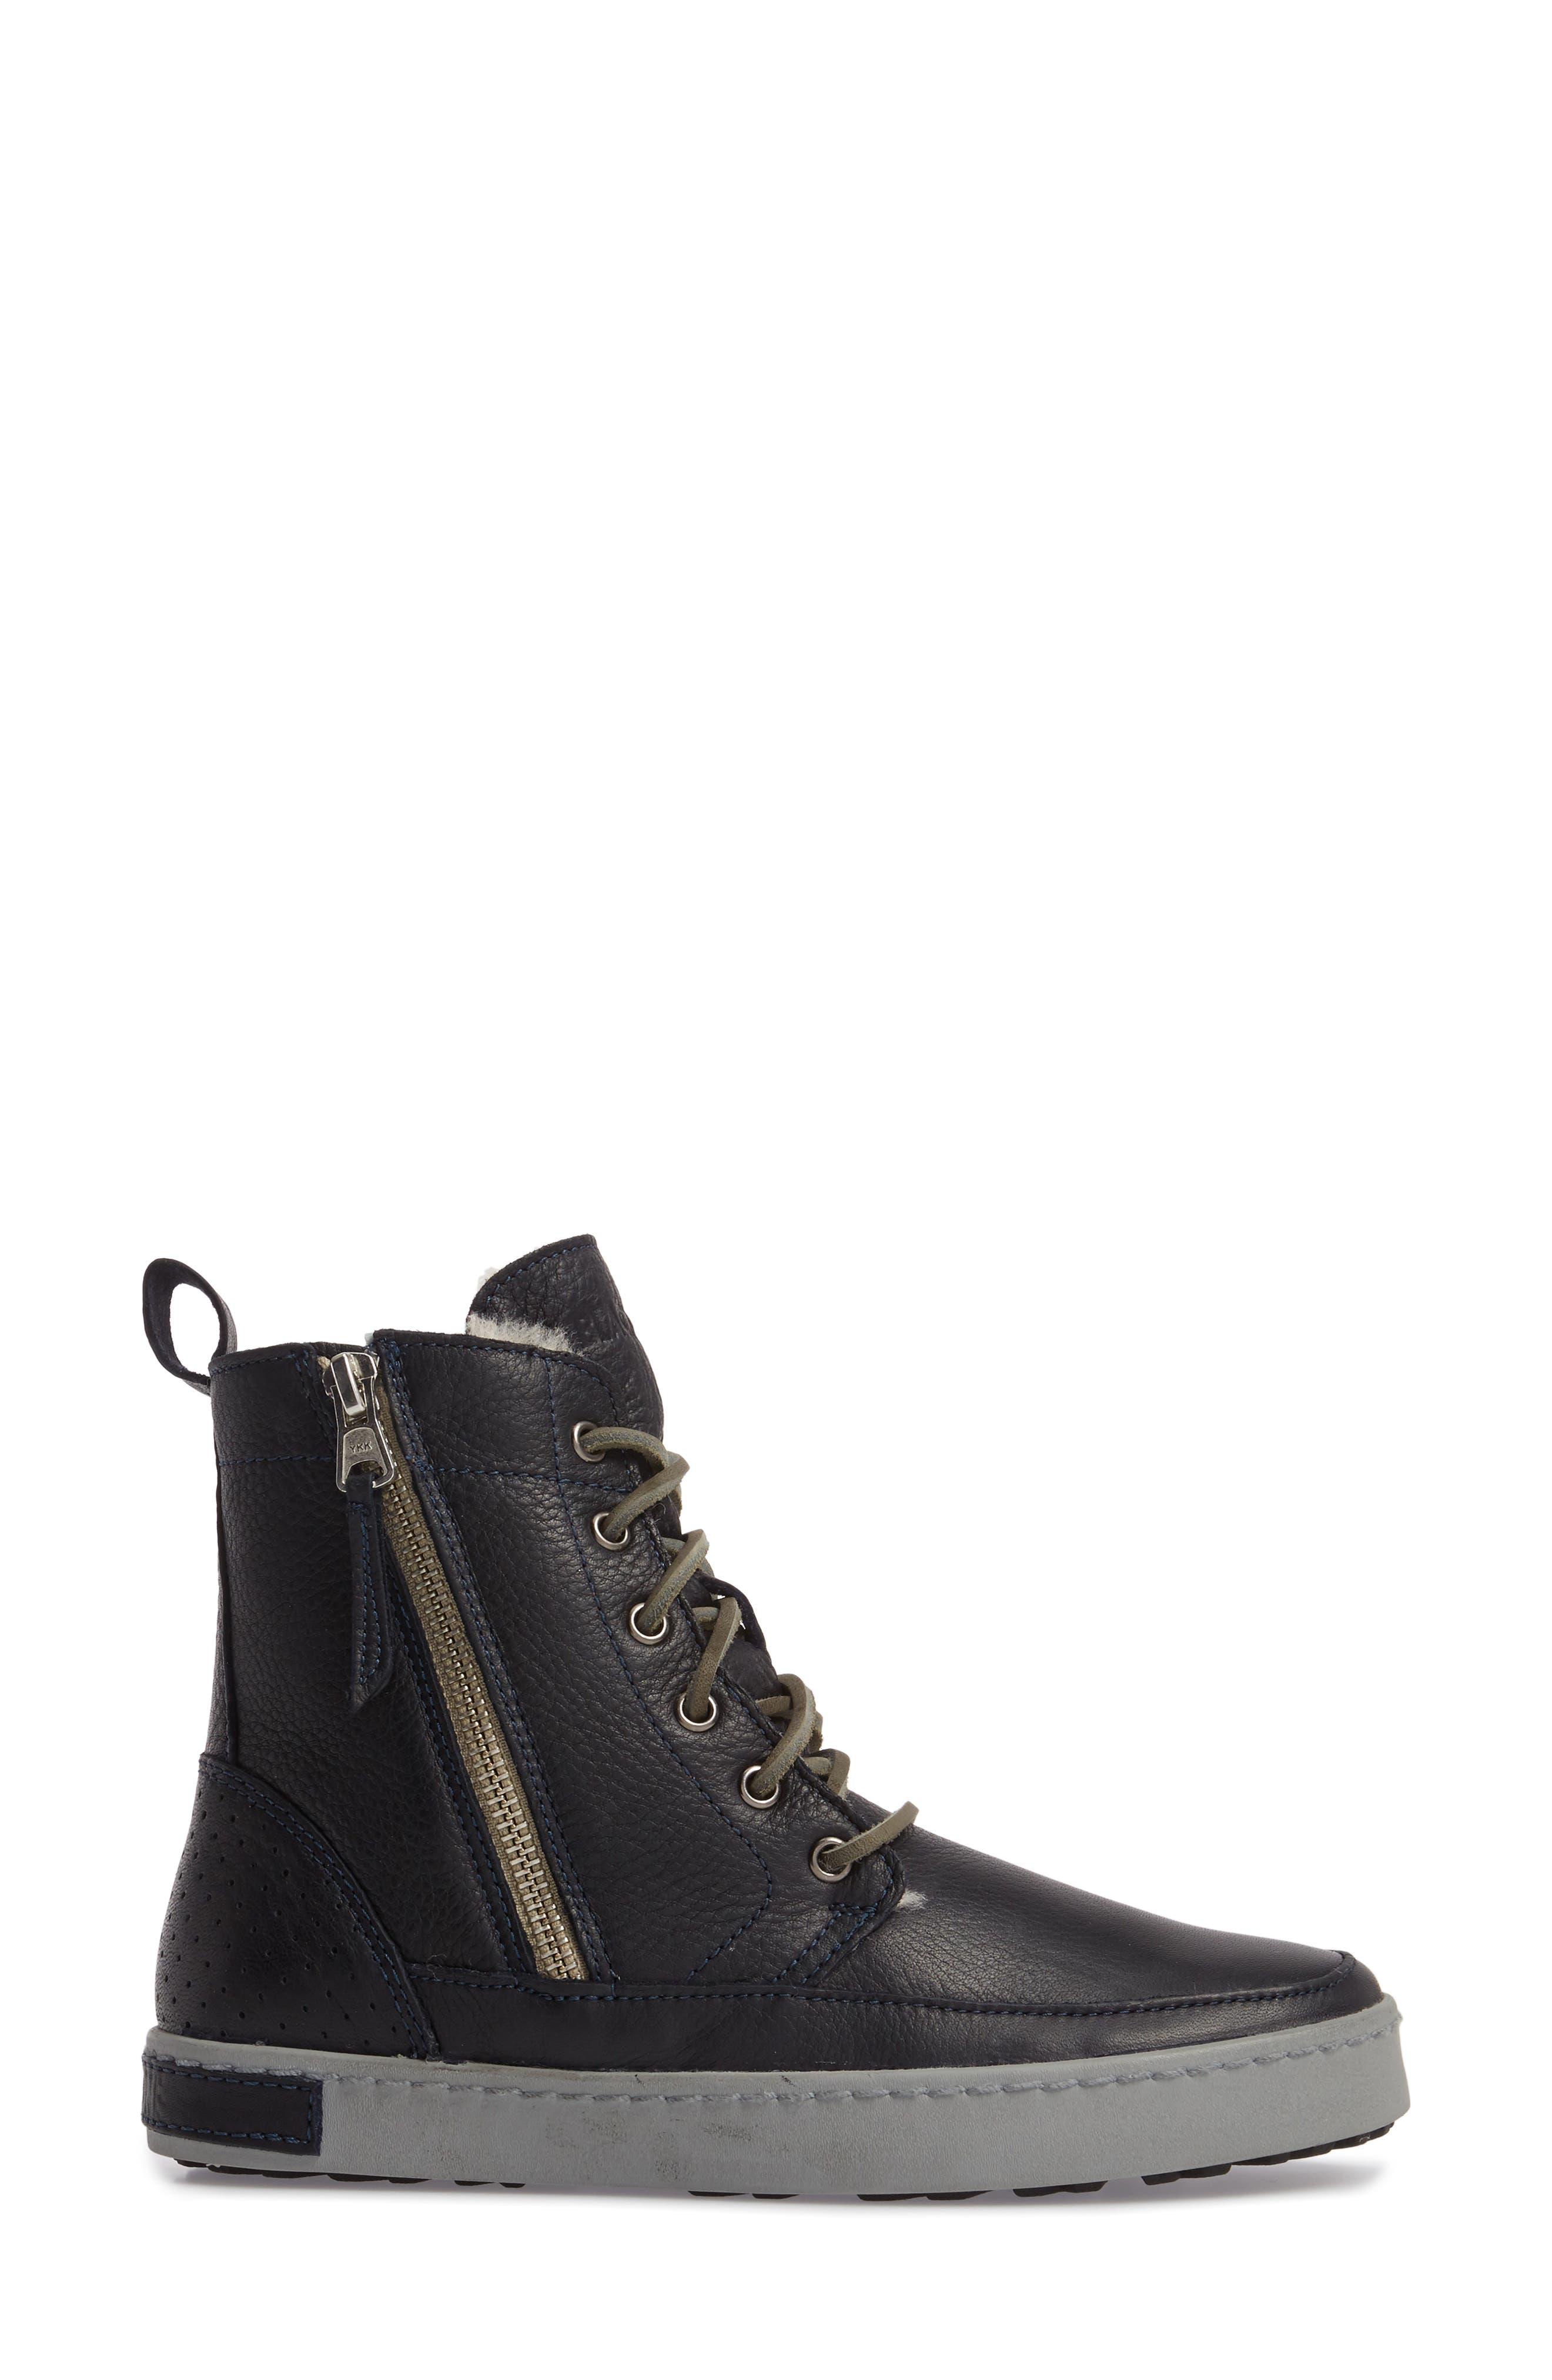 Alternate Image 3  - Blackstone 'CW96' Genuine Shearling Lined Sneaker Boot (Women)